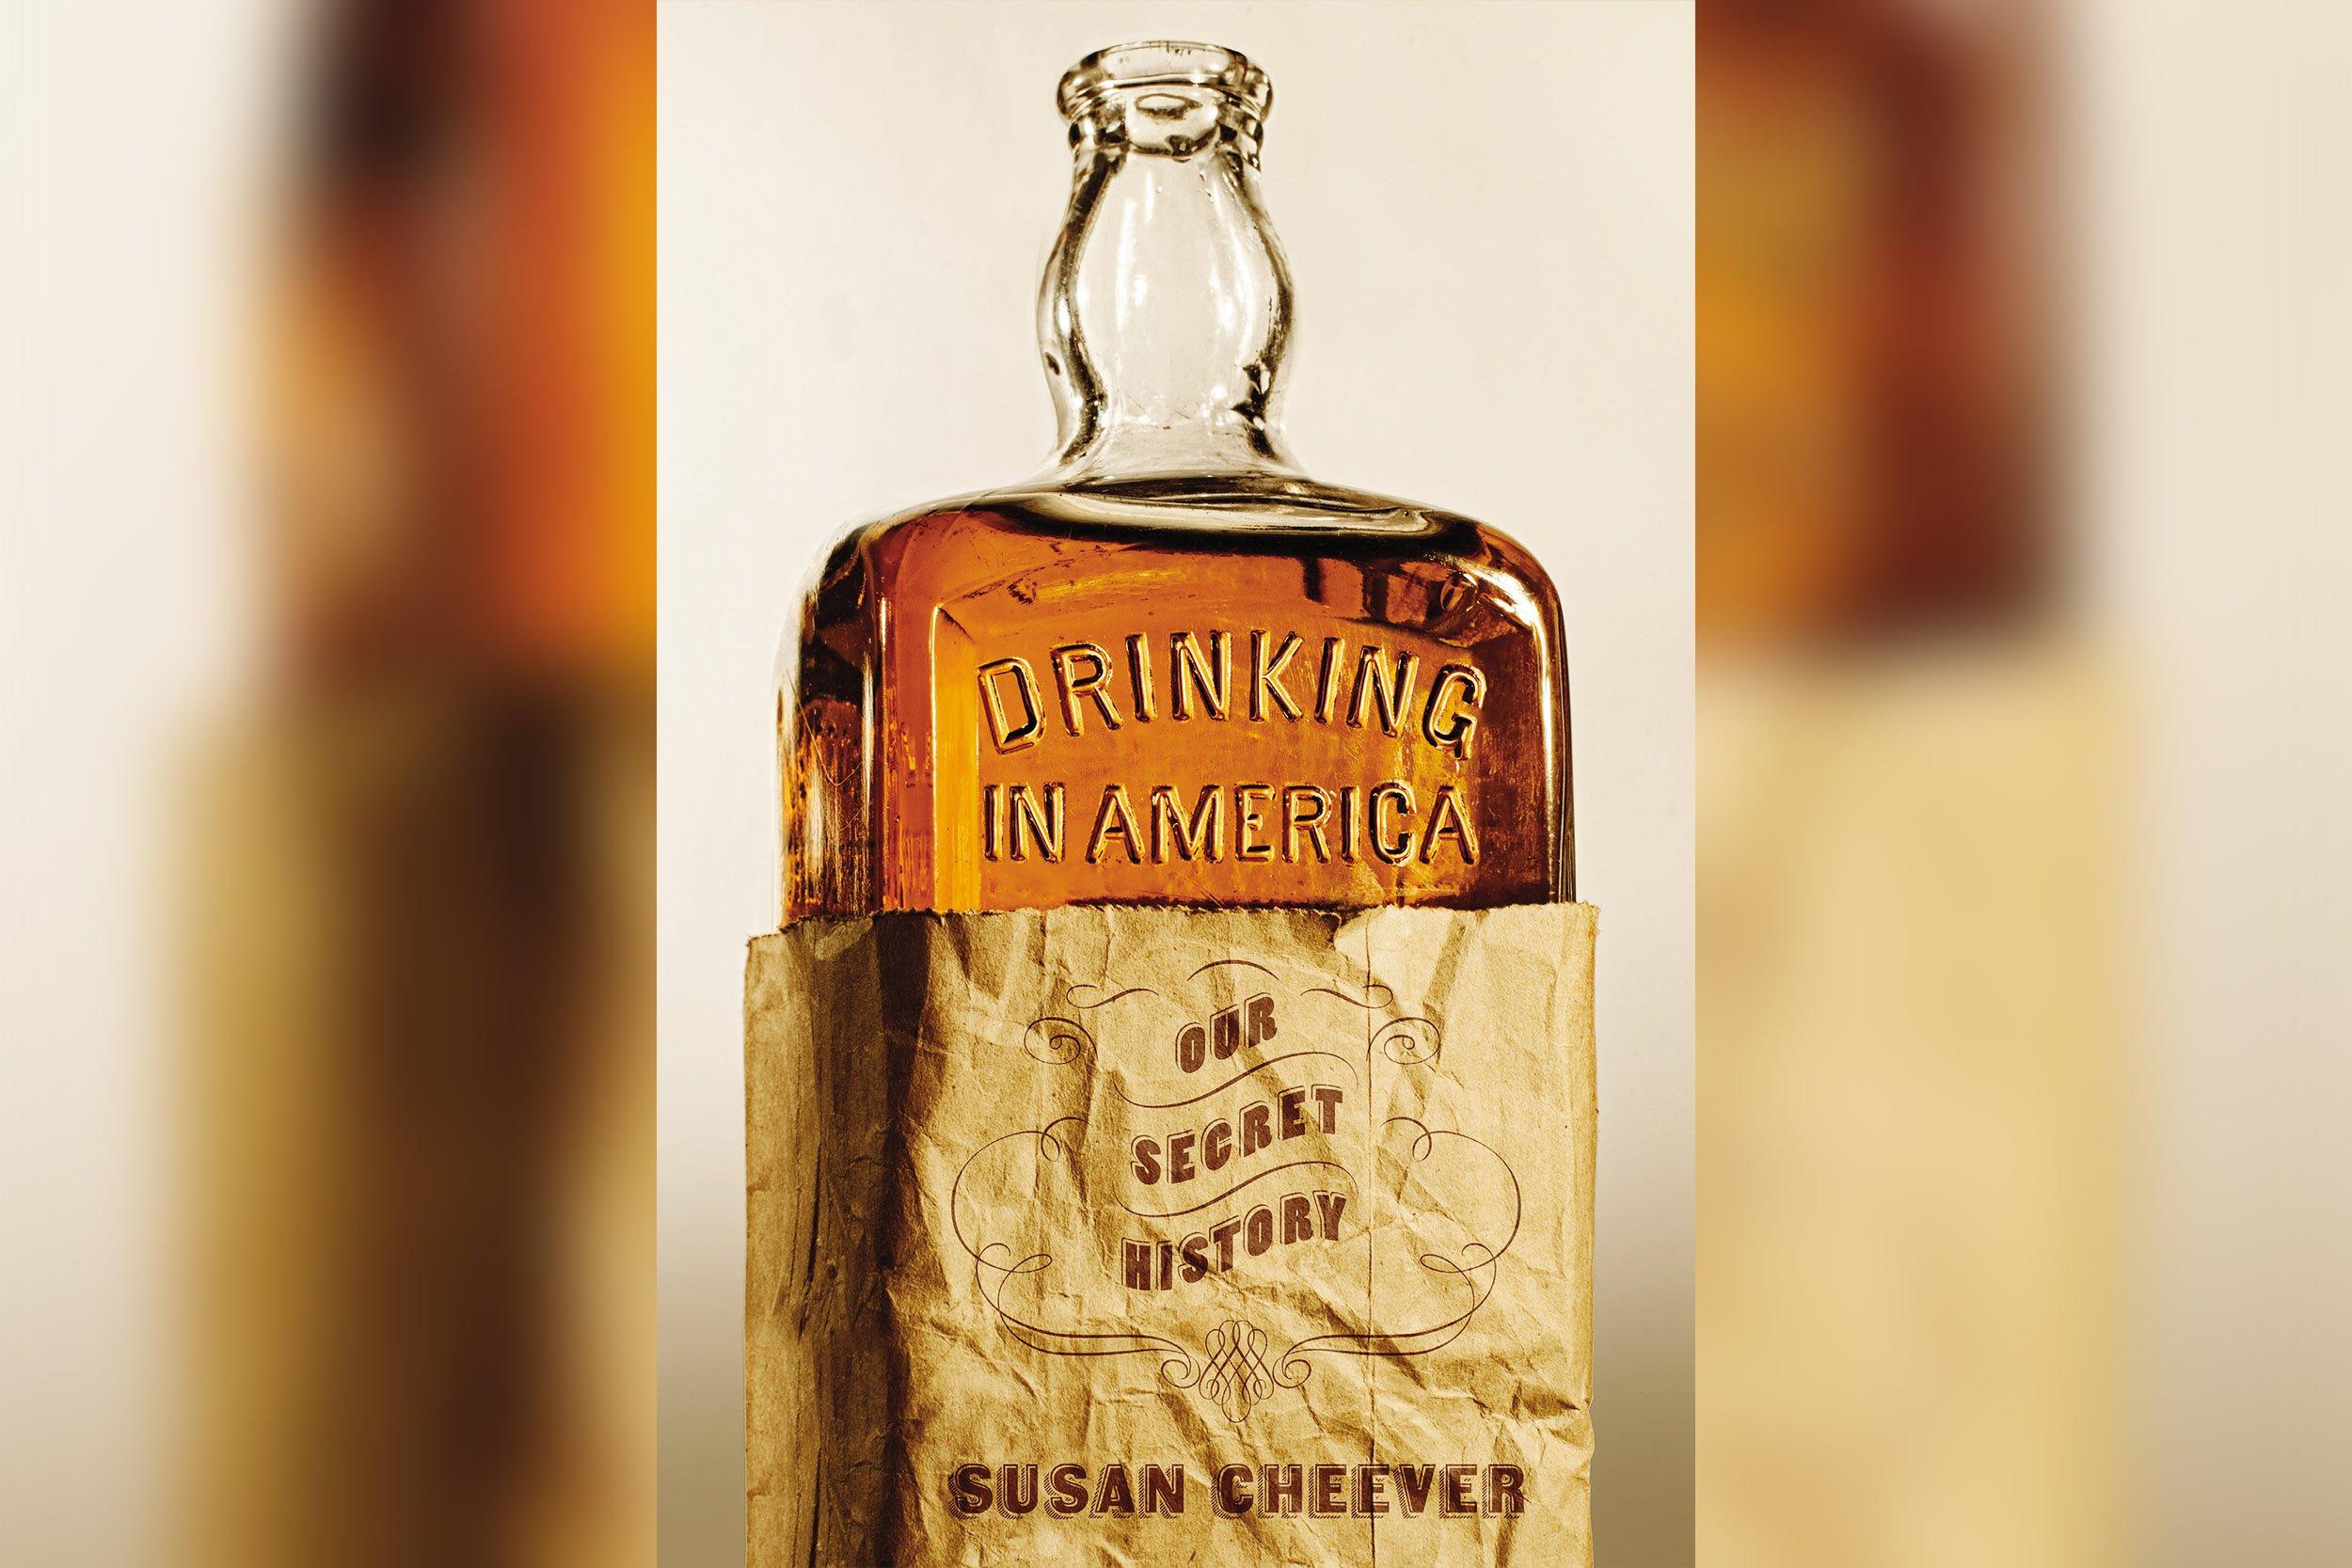 11_06_DrinkingInAmerica_01